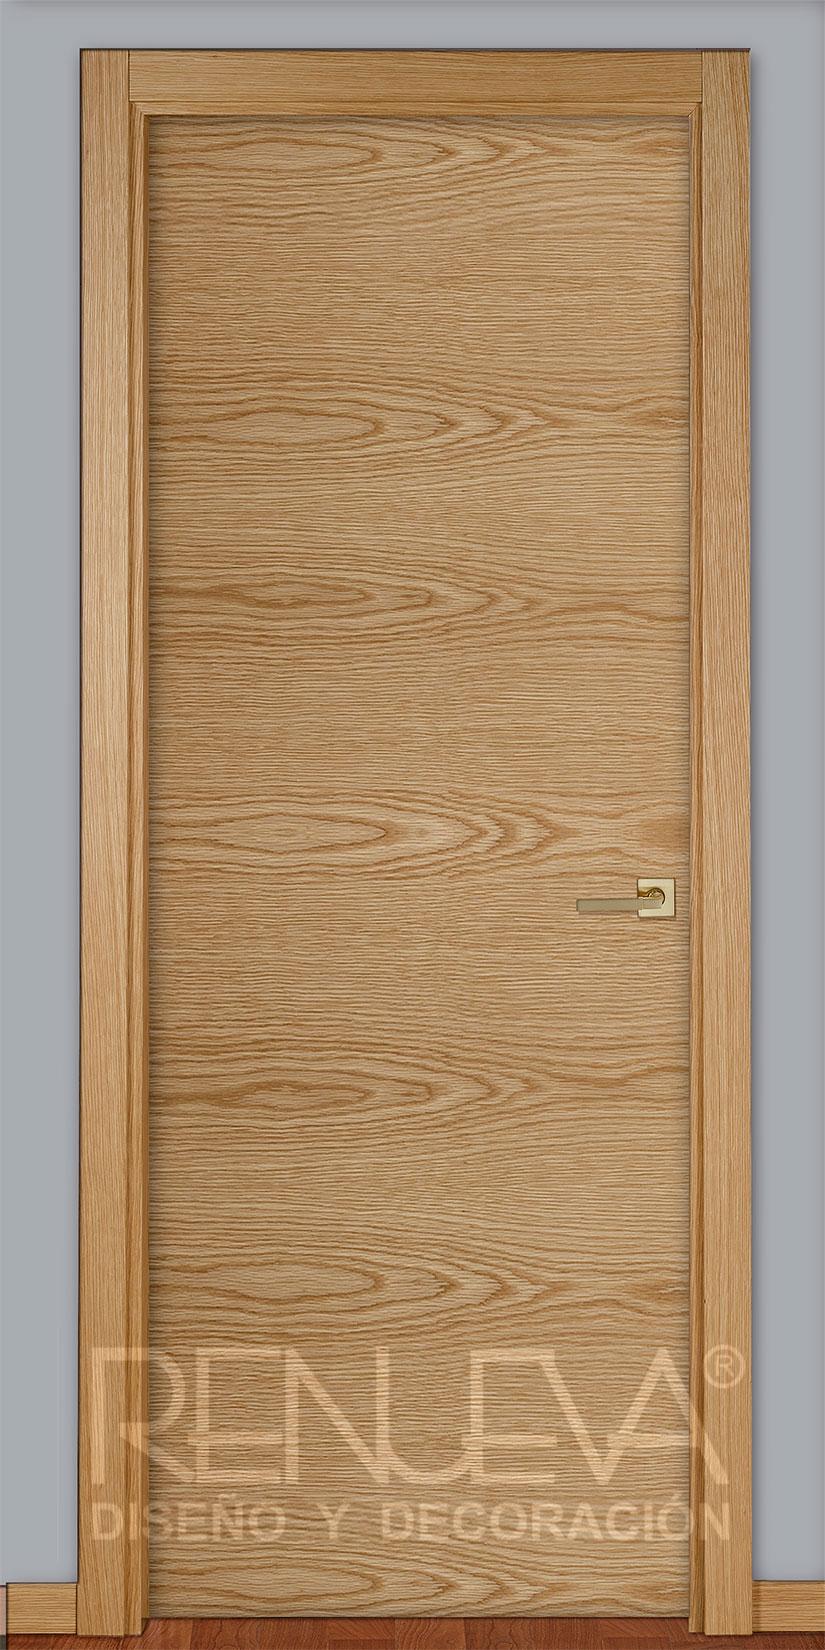 Oferta puerta madera de roble barnizada modelo rlt for Puerta madera roble